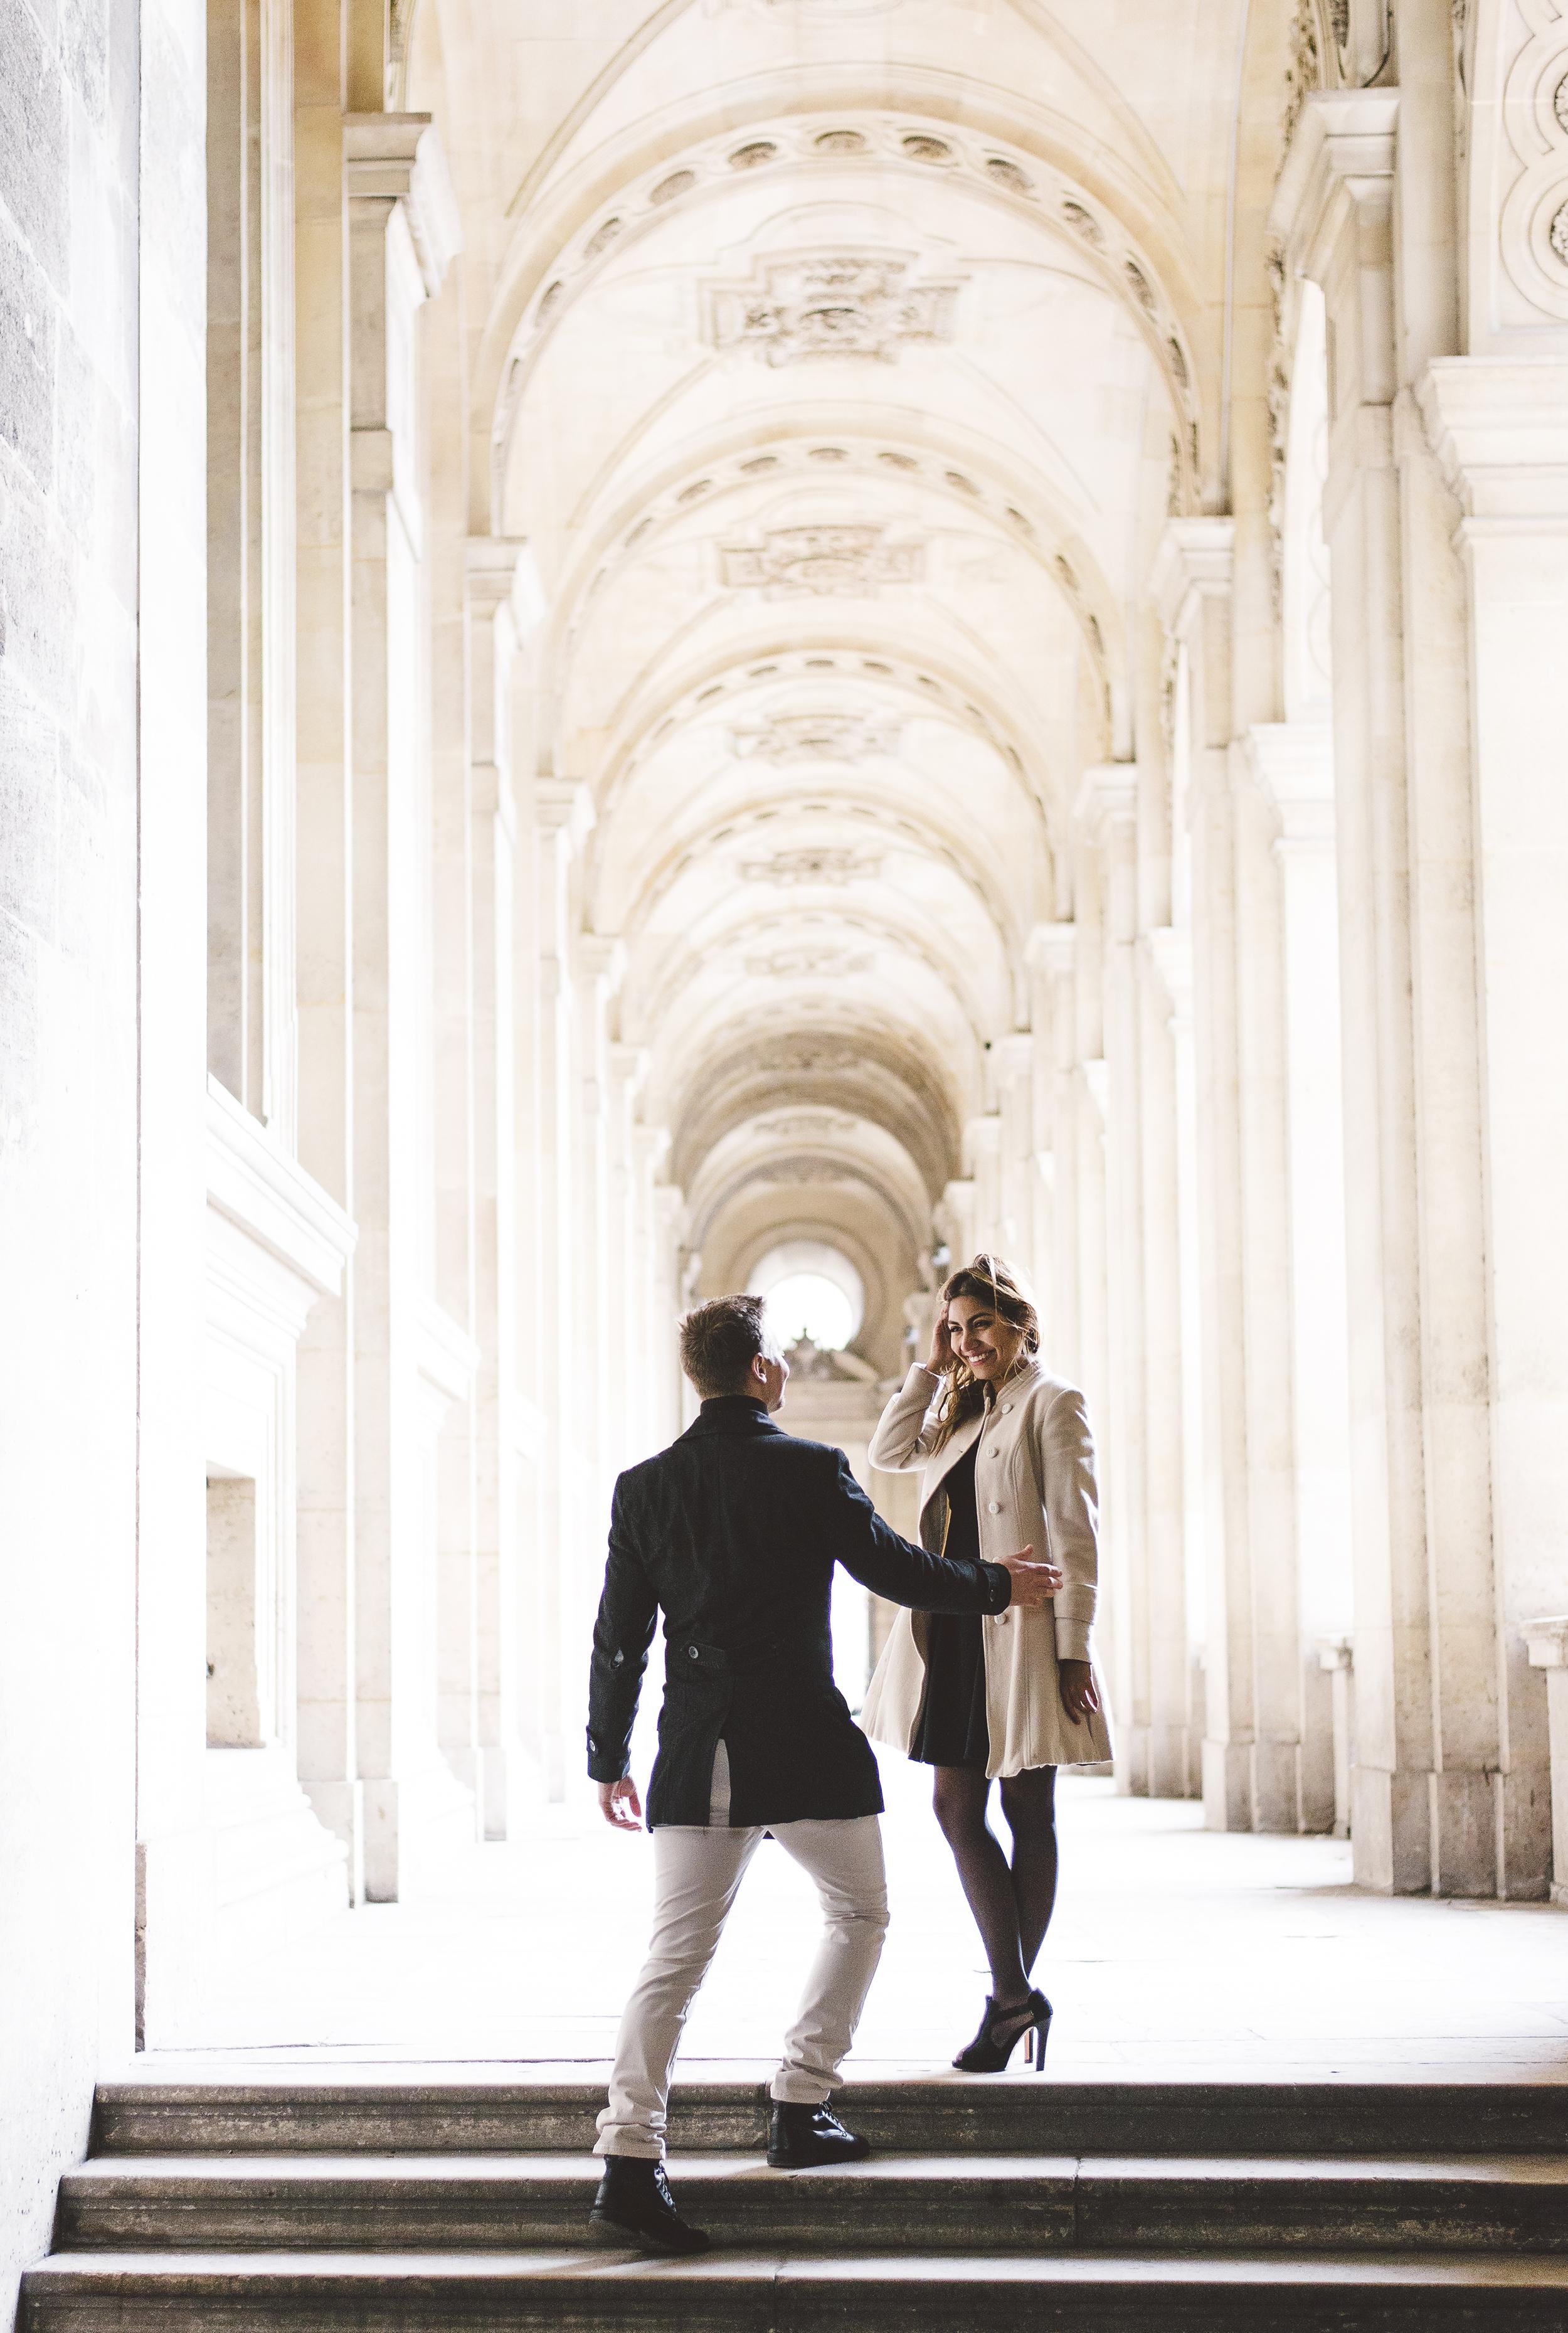 Couple-photoshoot-Anniversary-Paris-Louvre-Tuileries121.jpg